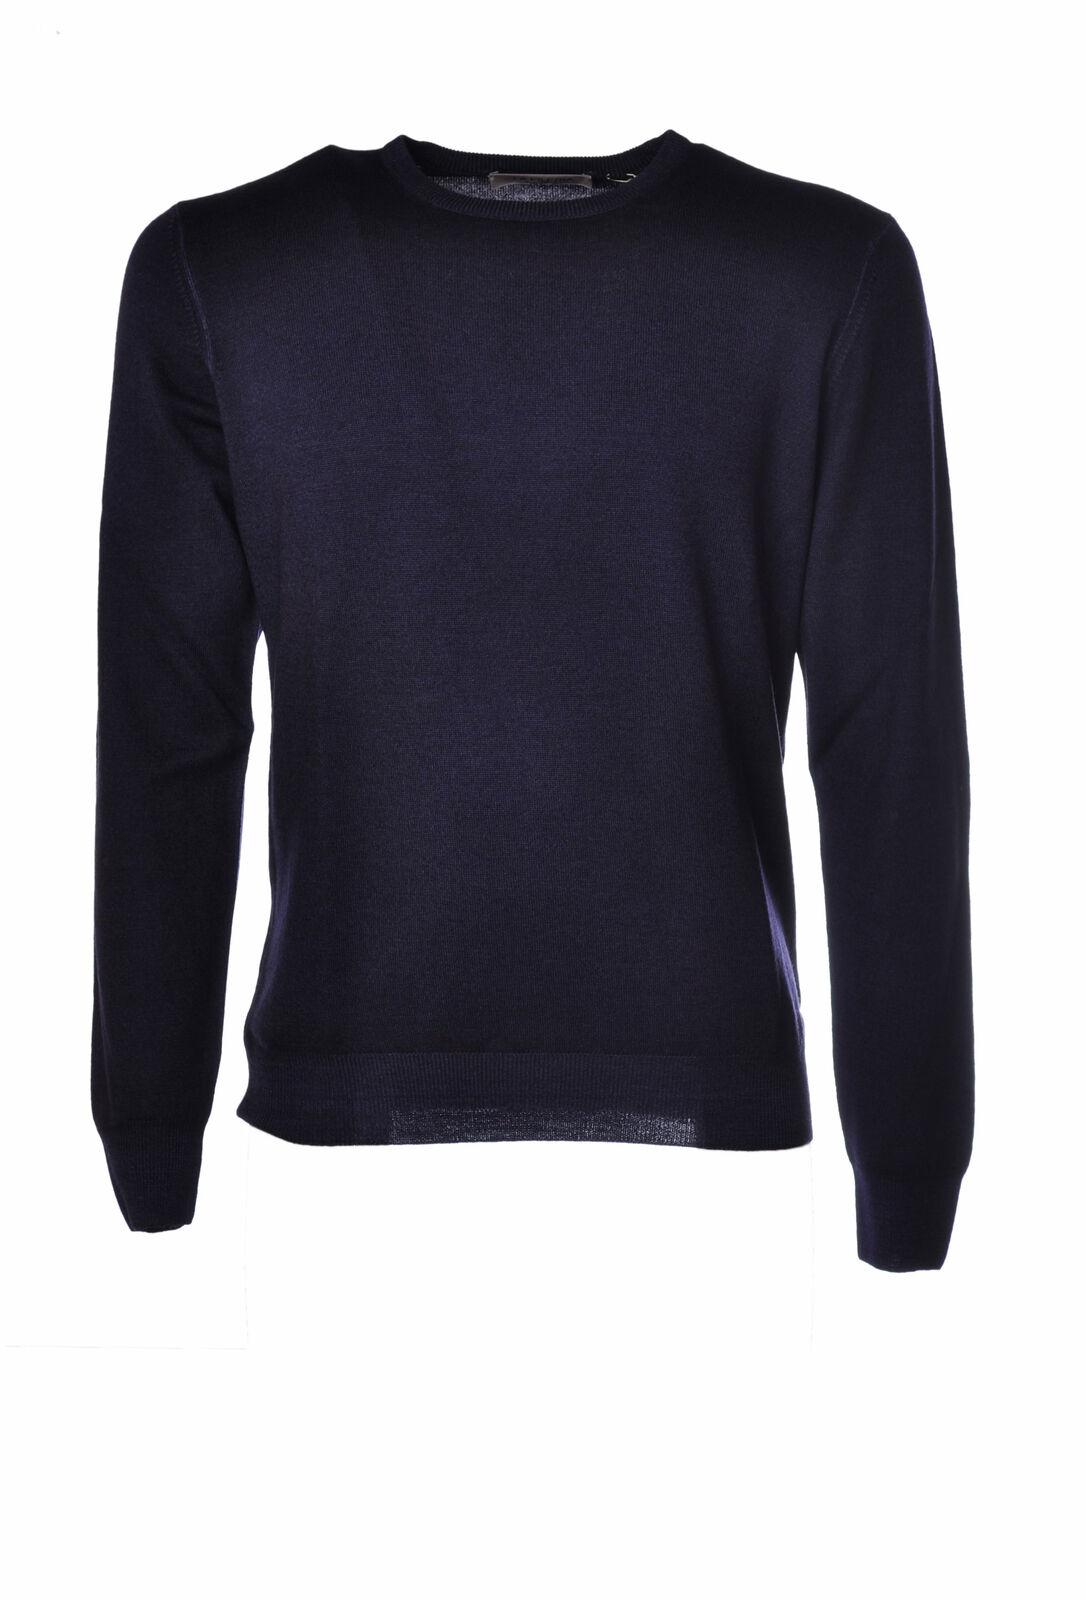 LA FILERIA  -  Sweaters - Male - Blau - 2616029N173615